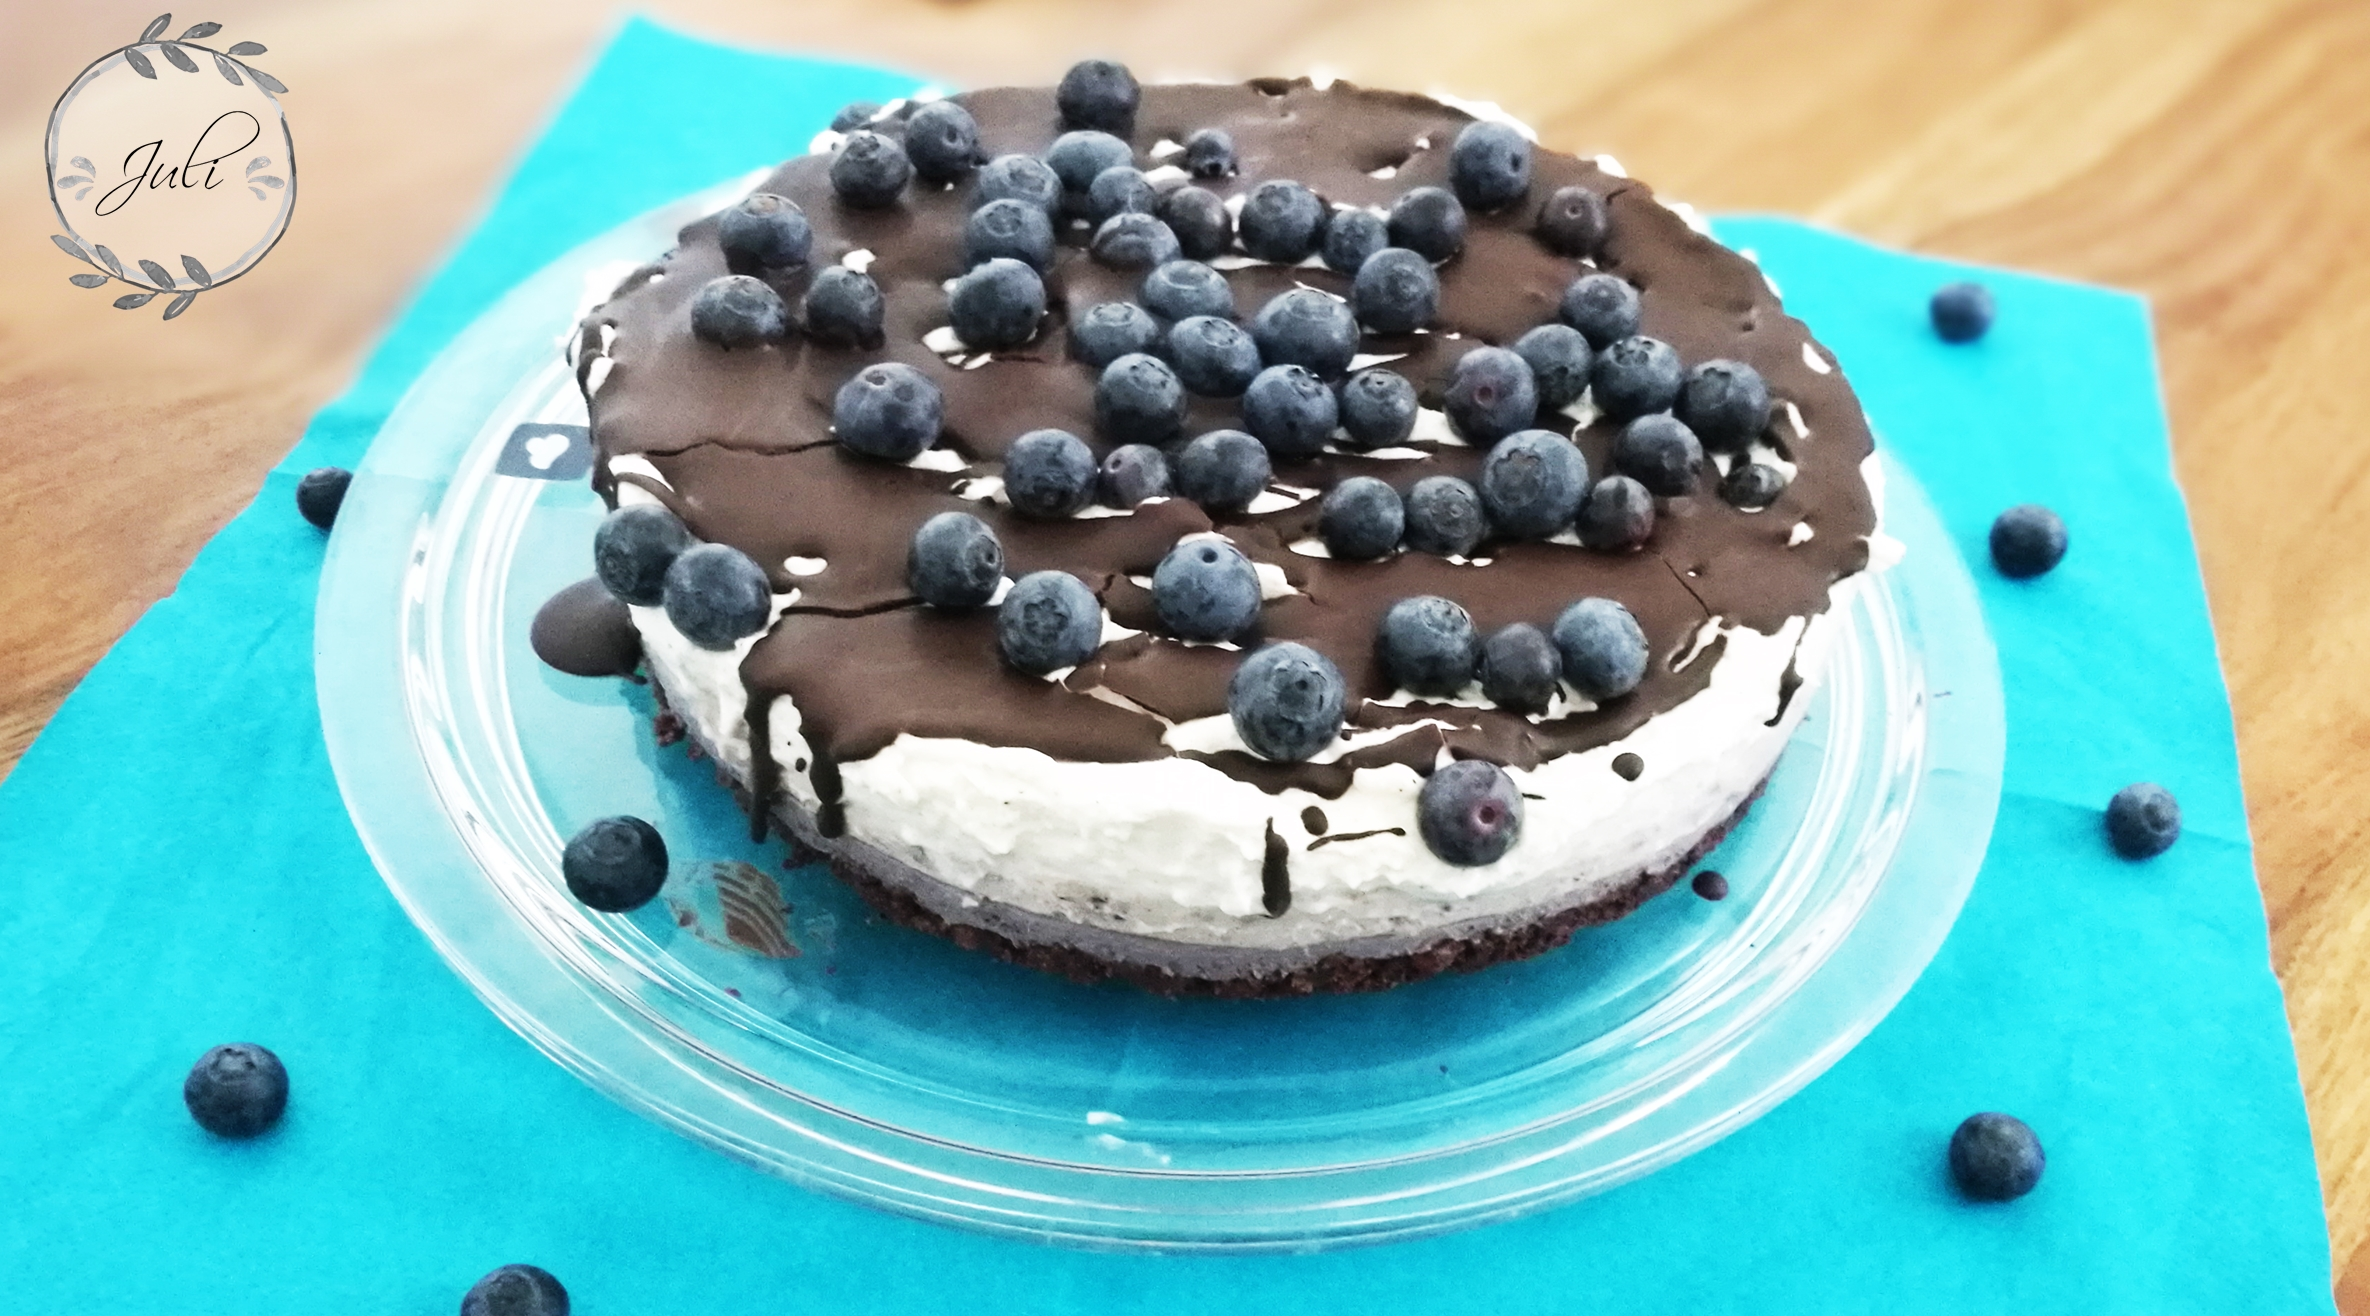 Ombré Blaubeer Kuchen